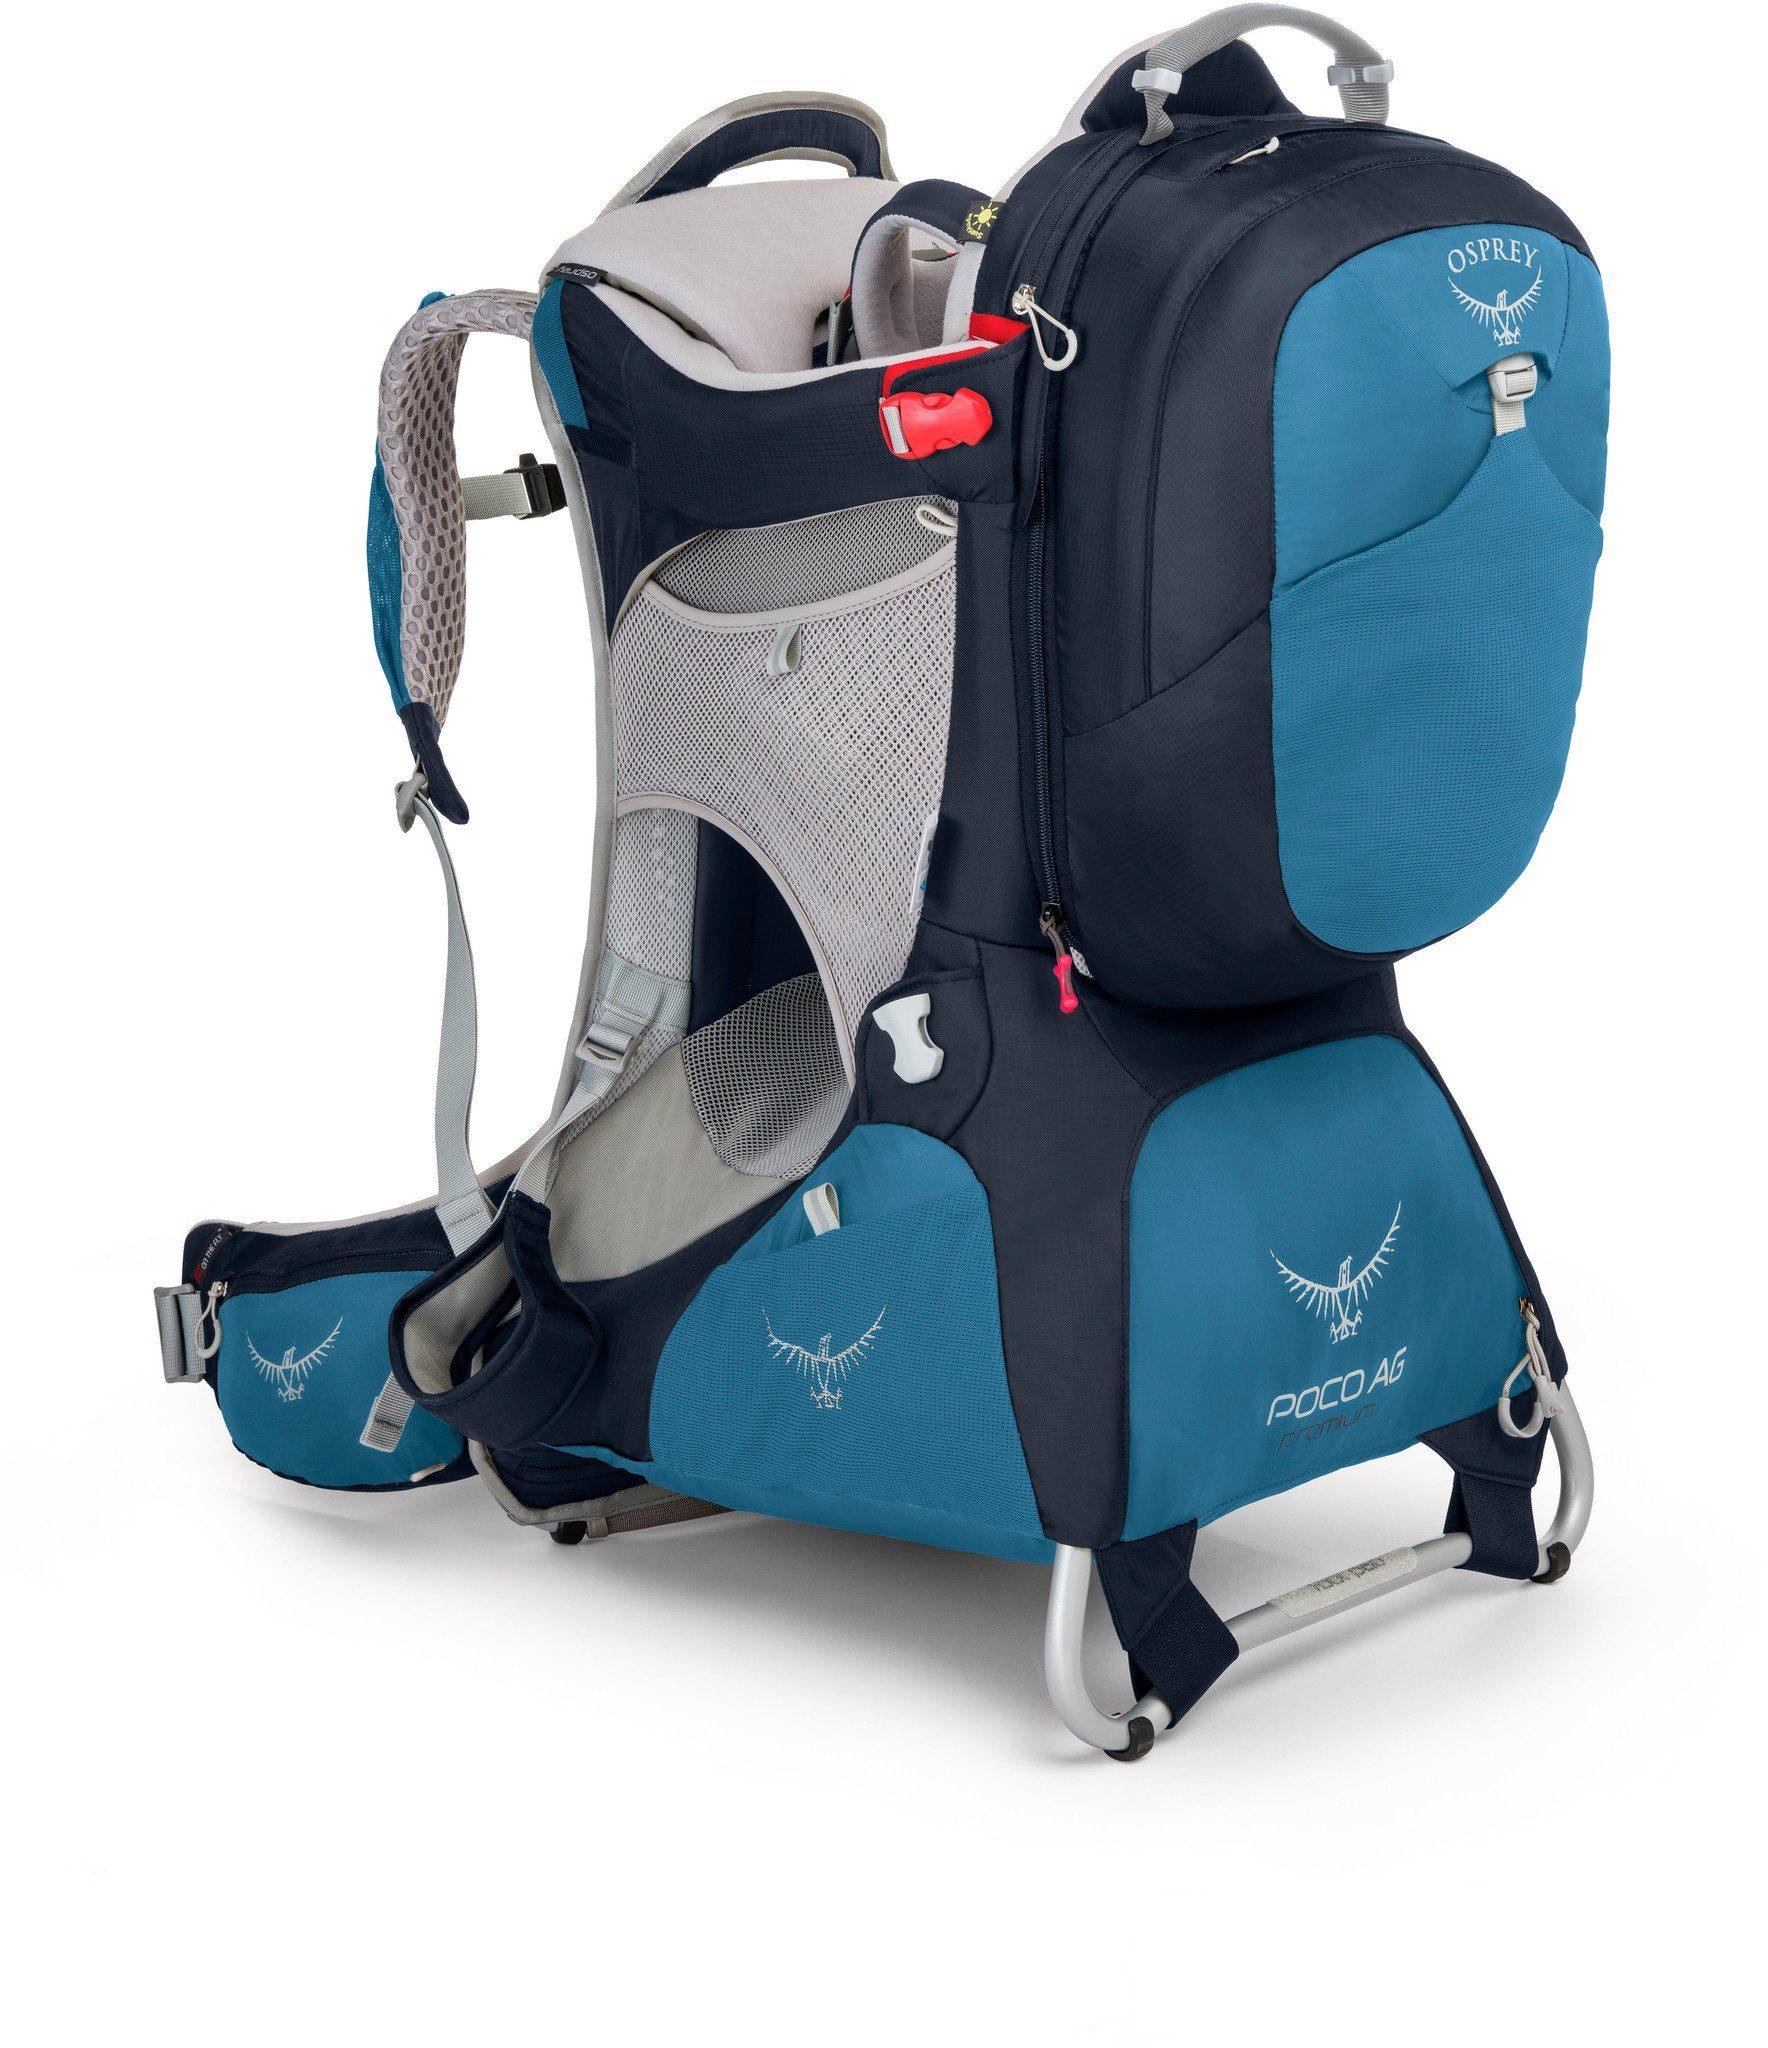 Osprey Kindertrage »Poco AG Premium Child Carrier«